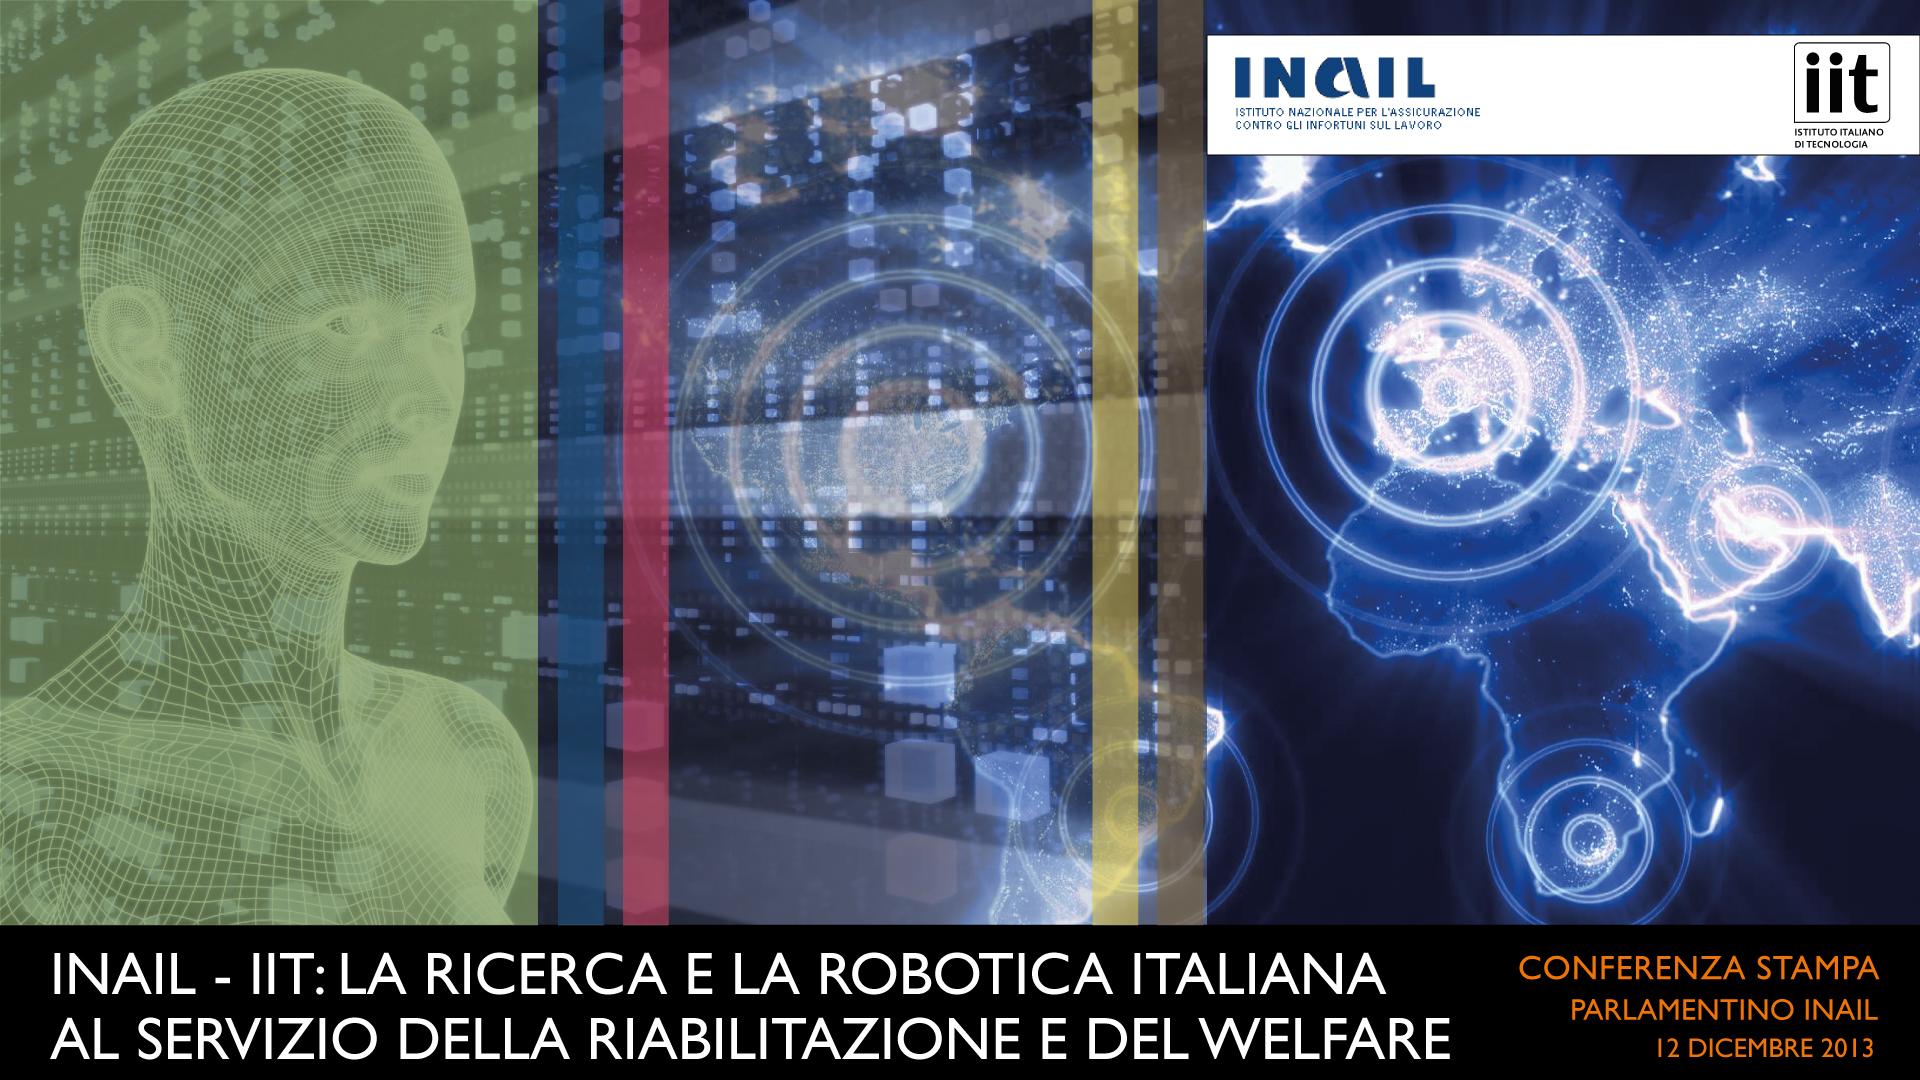 Accordo_Inail-IIT_locandina.jpeg